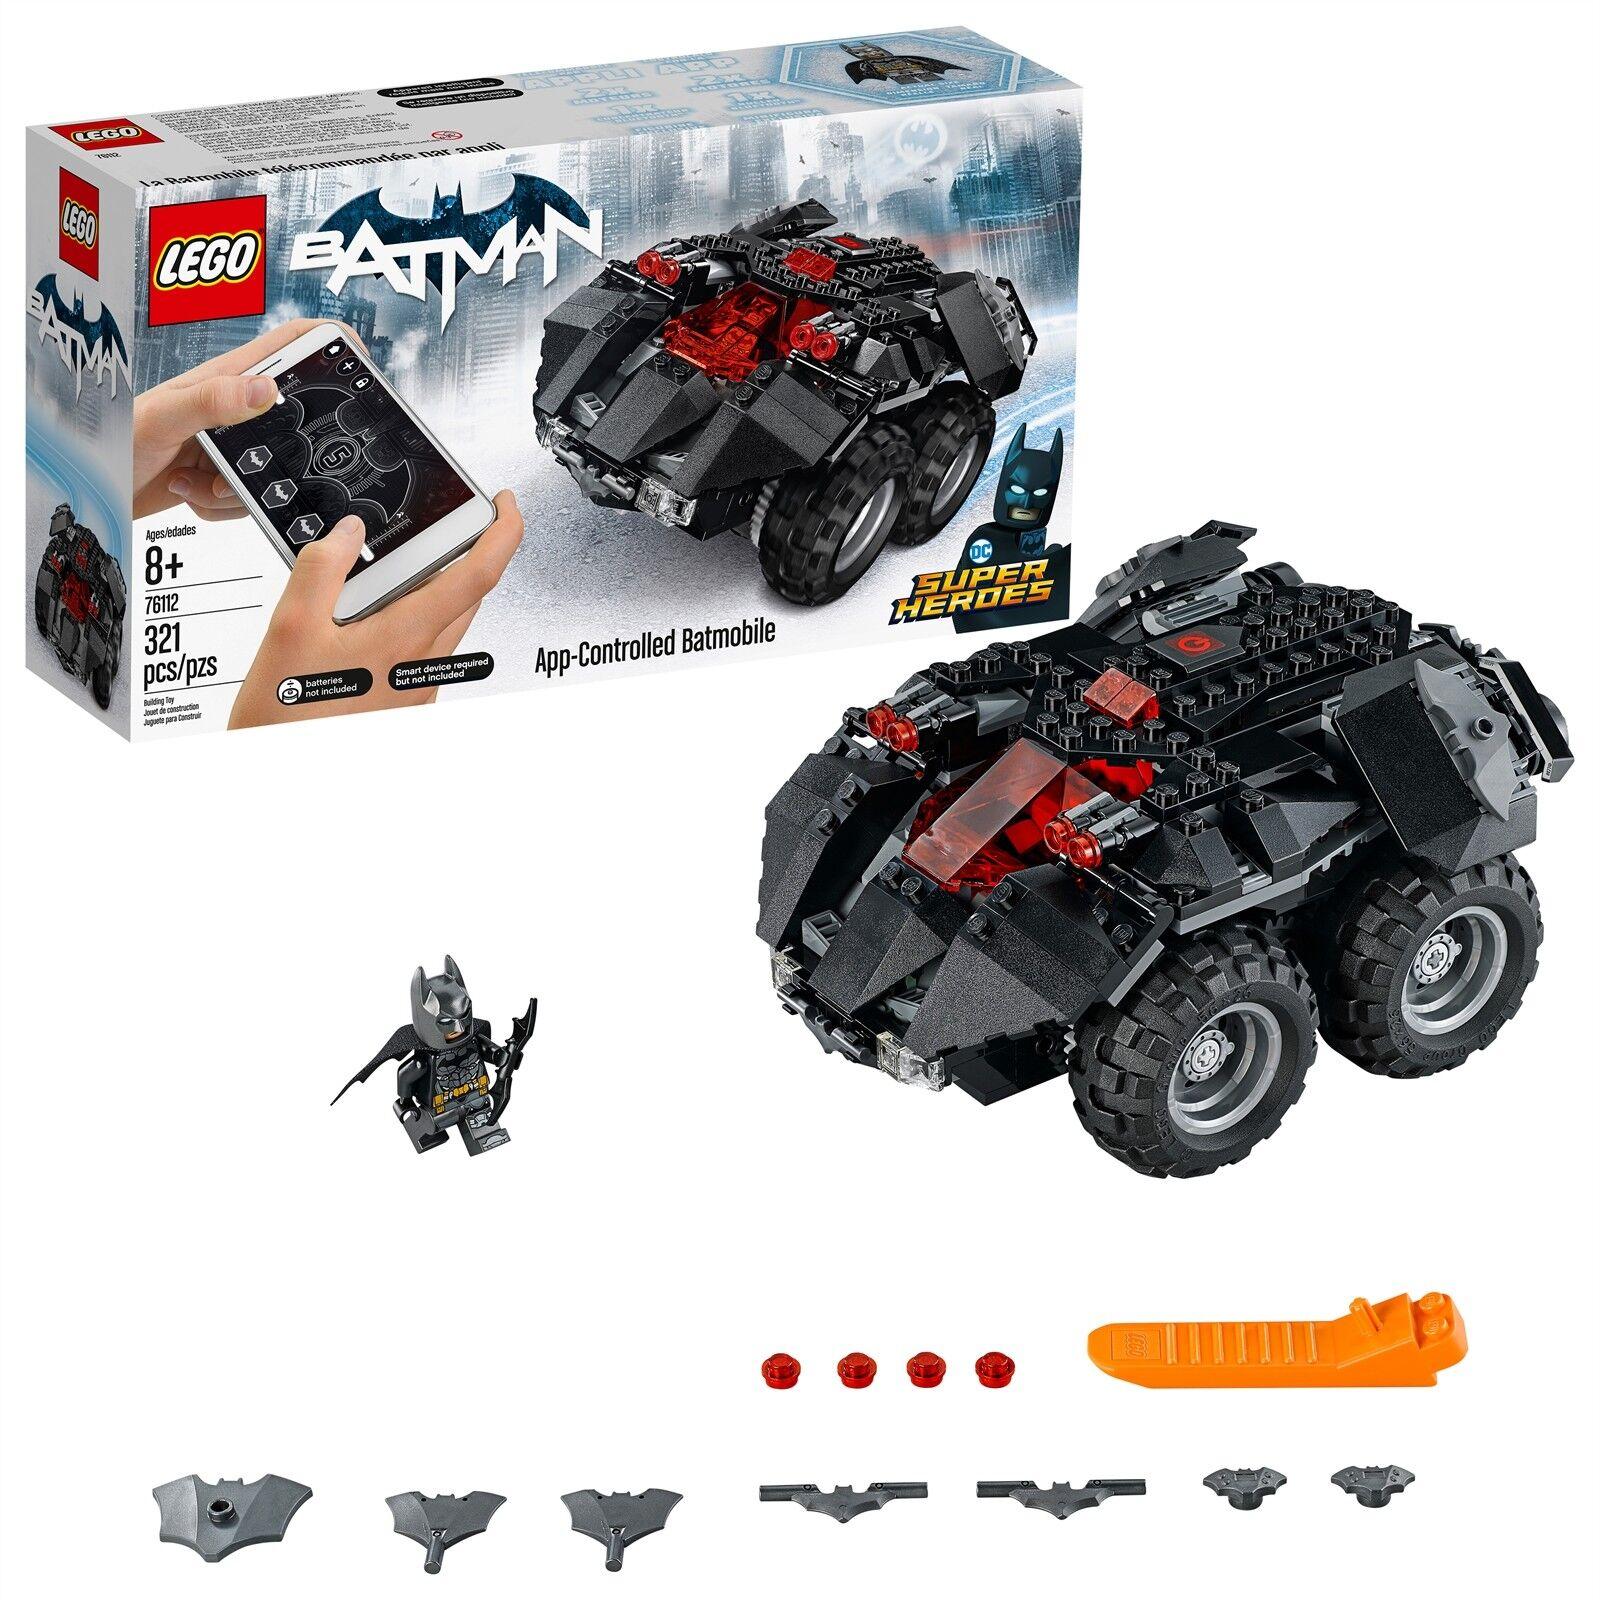 LEGO® DC Super Heroes - App-Controlled Batmobile 76112 321 Pcs